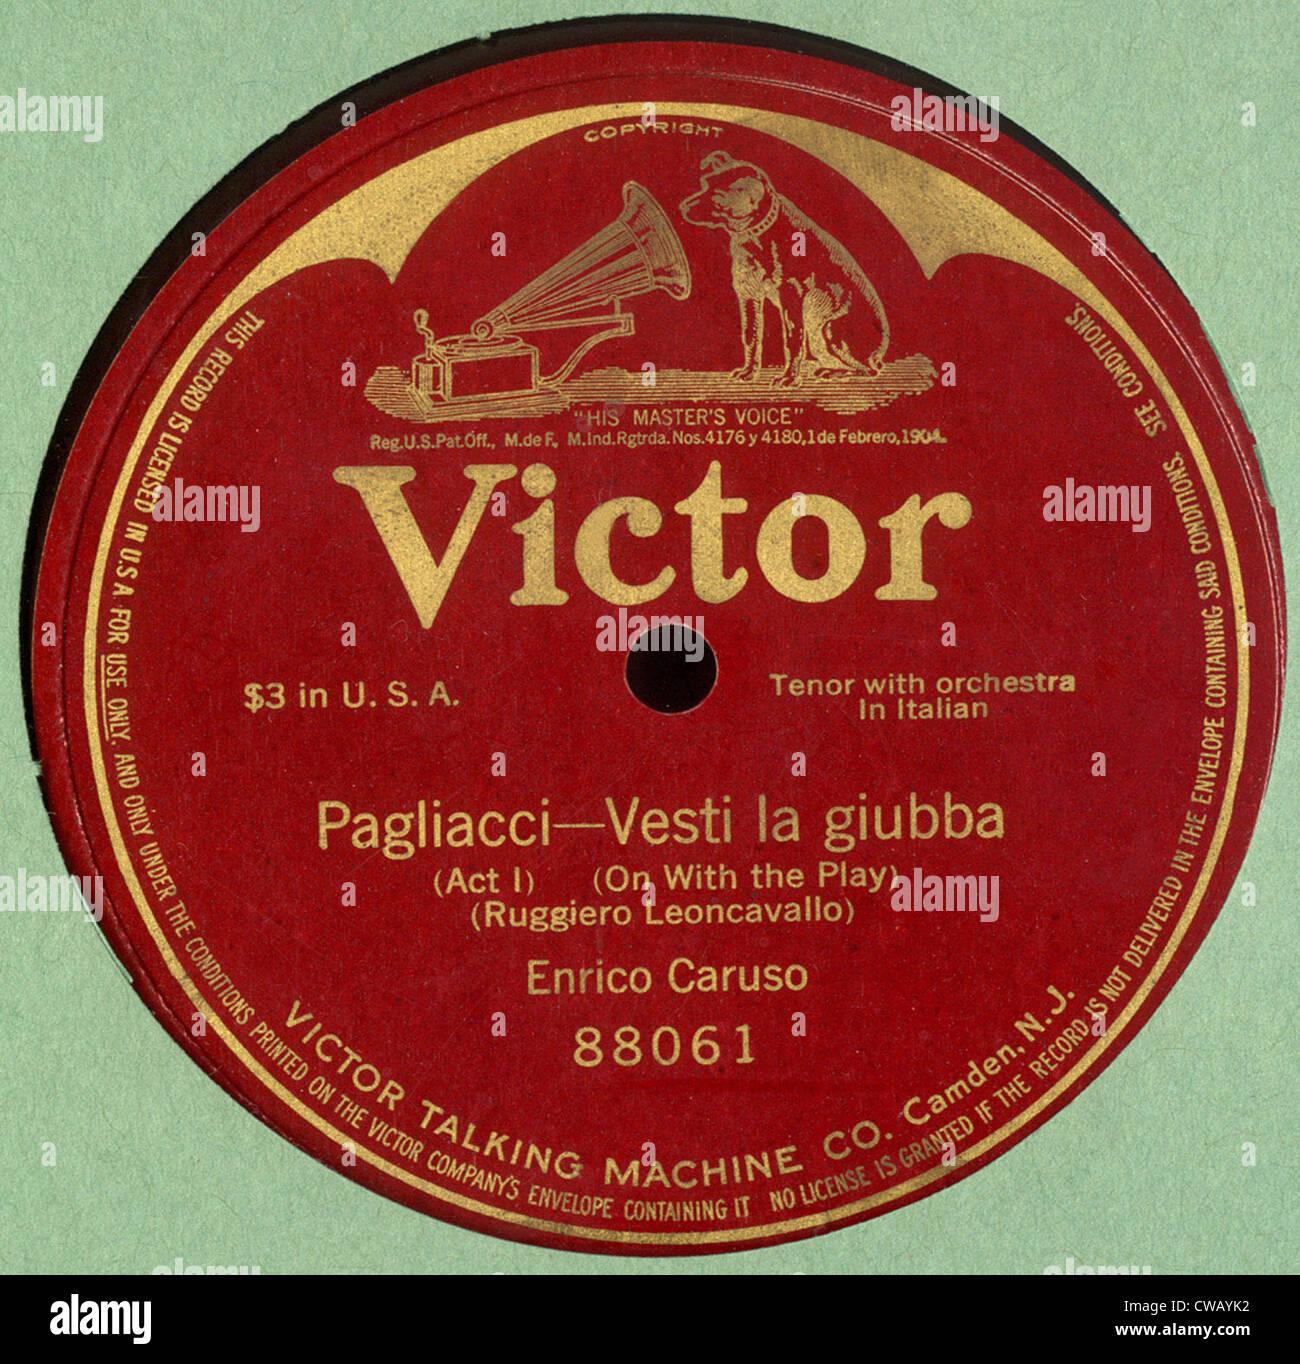 Gramophone Records Stock Photos Amp Gramophone Records Stock